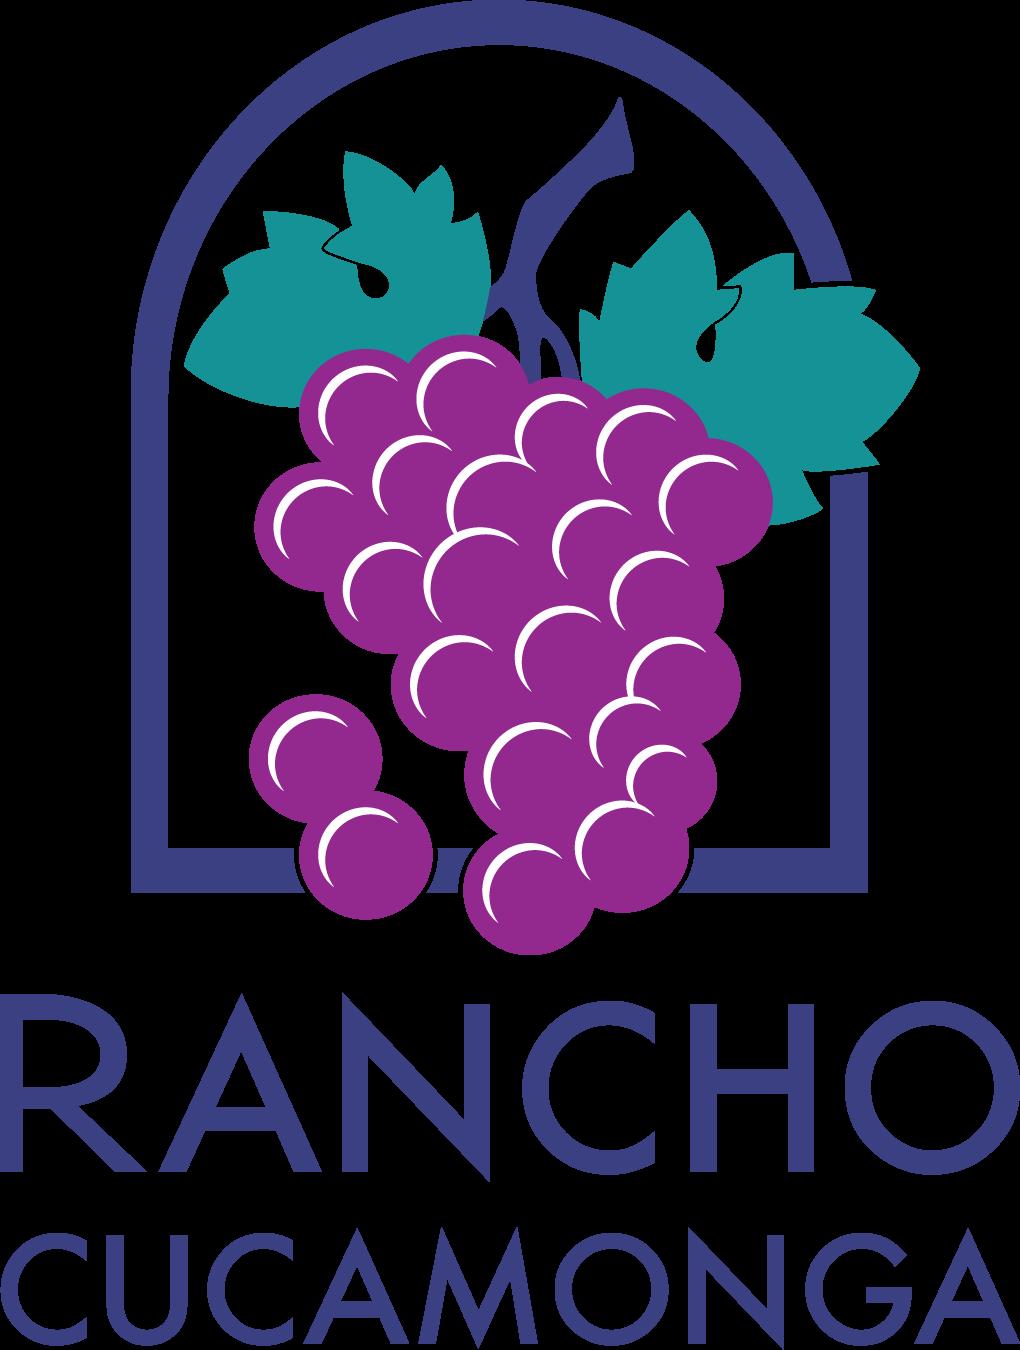 19_RanchoCucamona_Logo.png